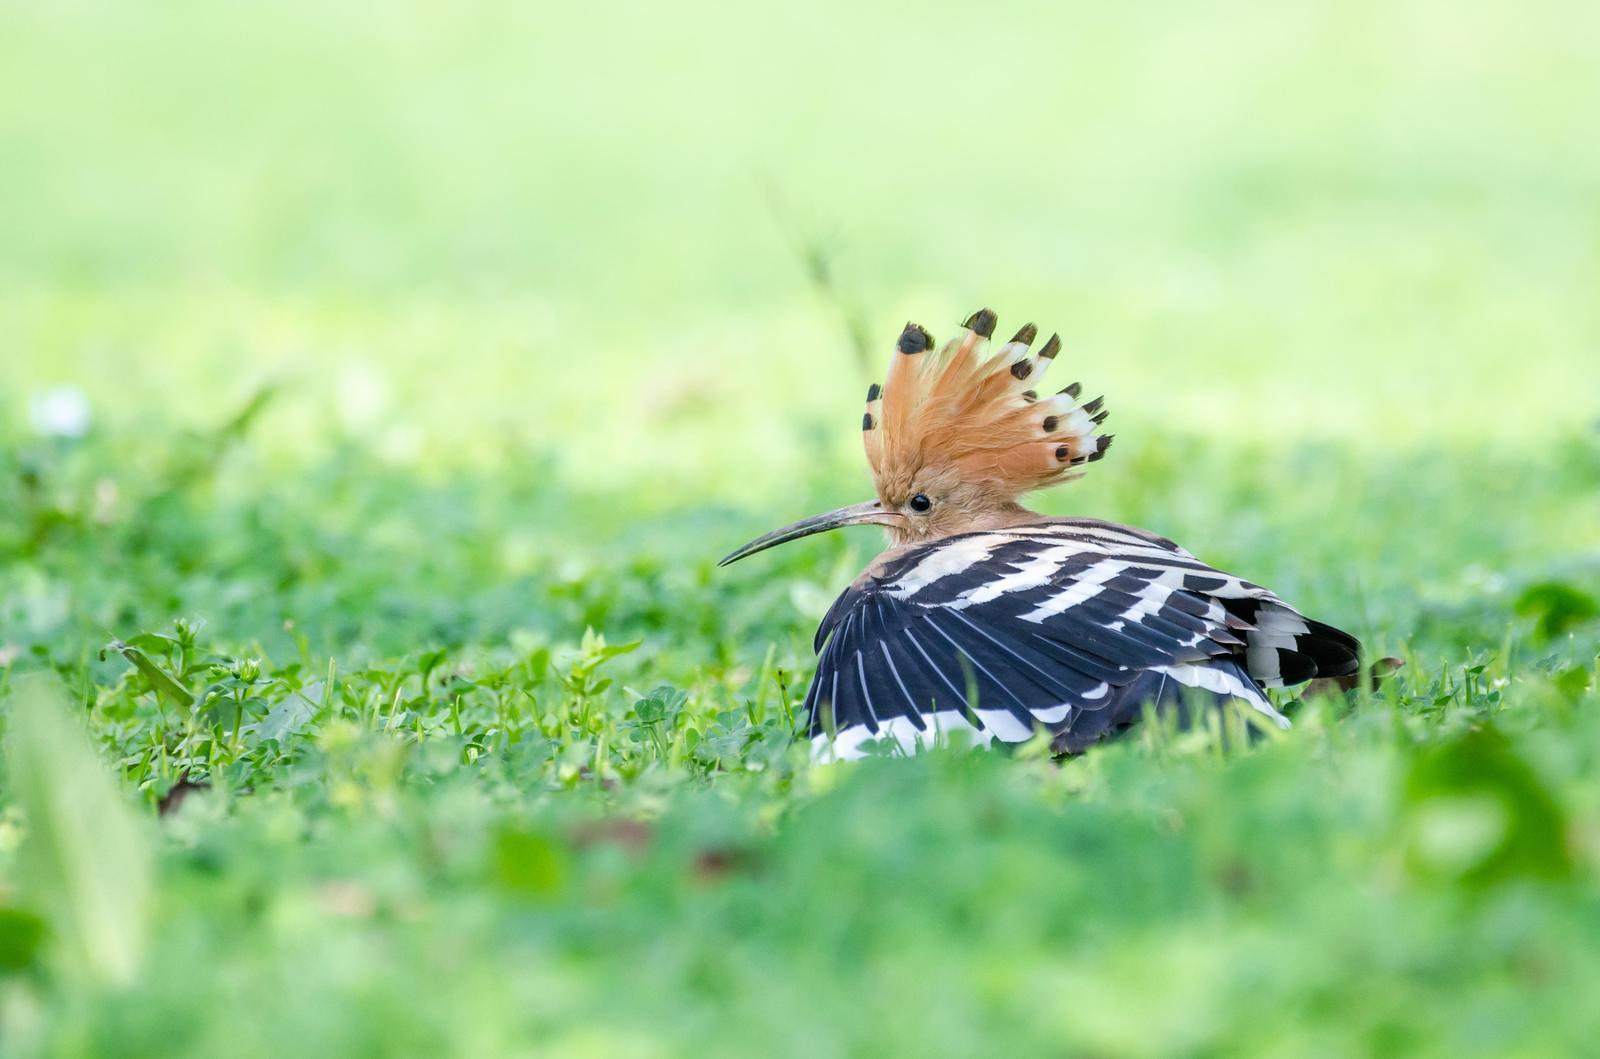 Eurasian Hoopoe Photo by Zagham Awan